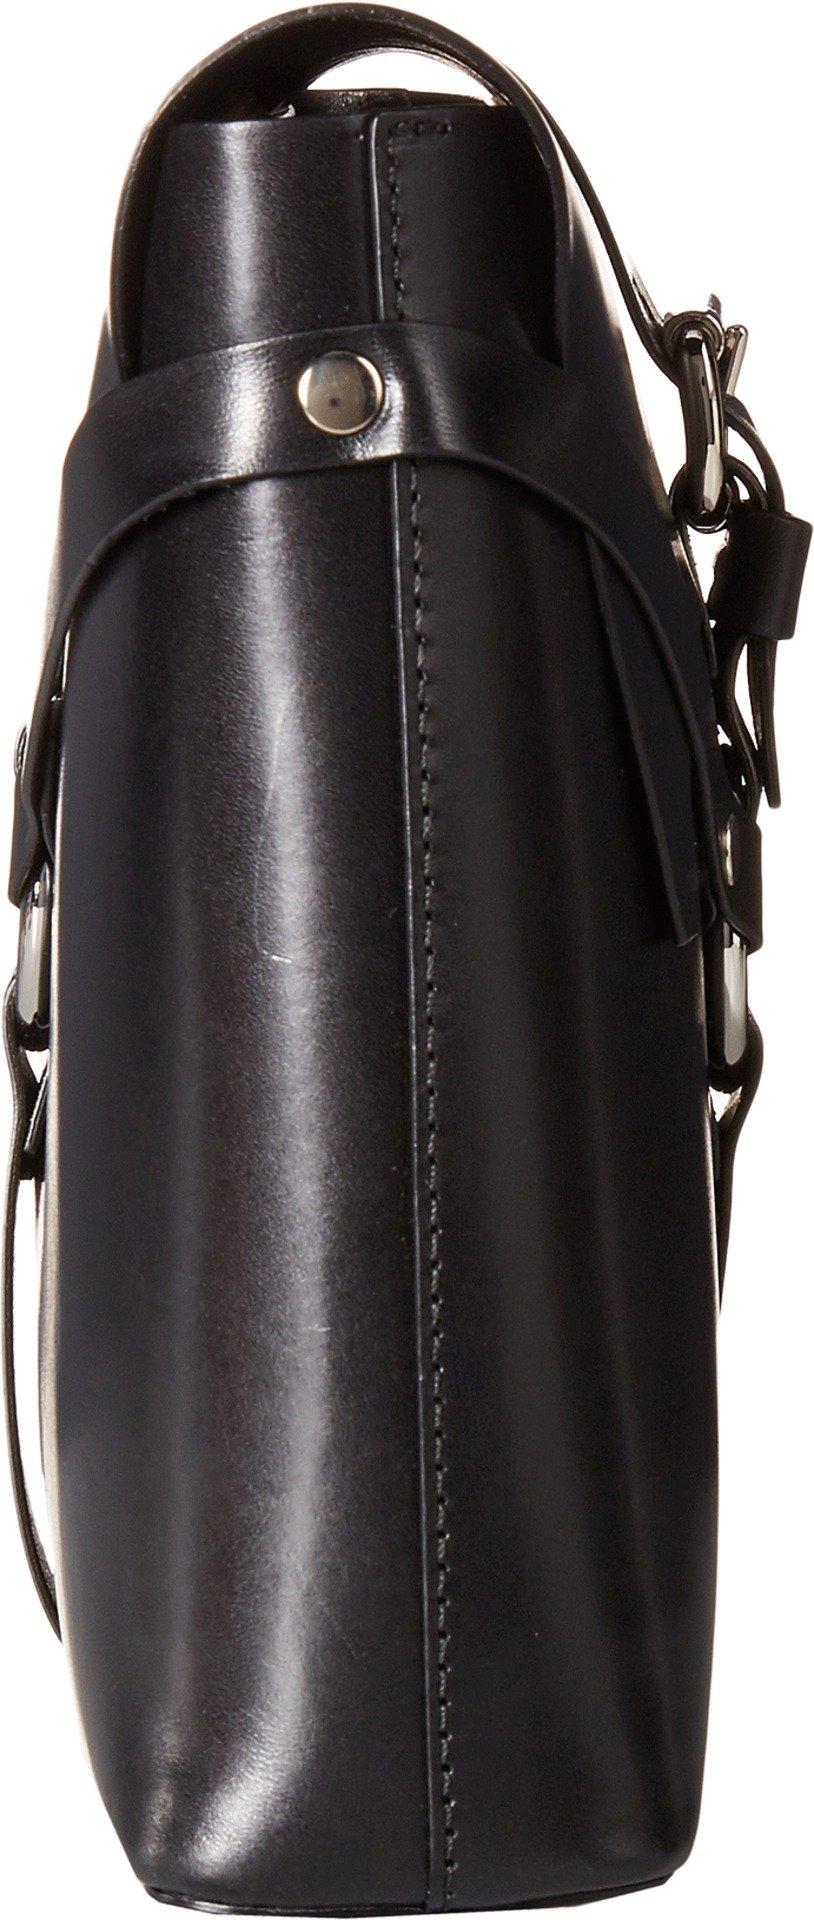 Vivienne Westwood Women's Betty Clutch Black One Size by Vivienne Westwood (Image #3)